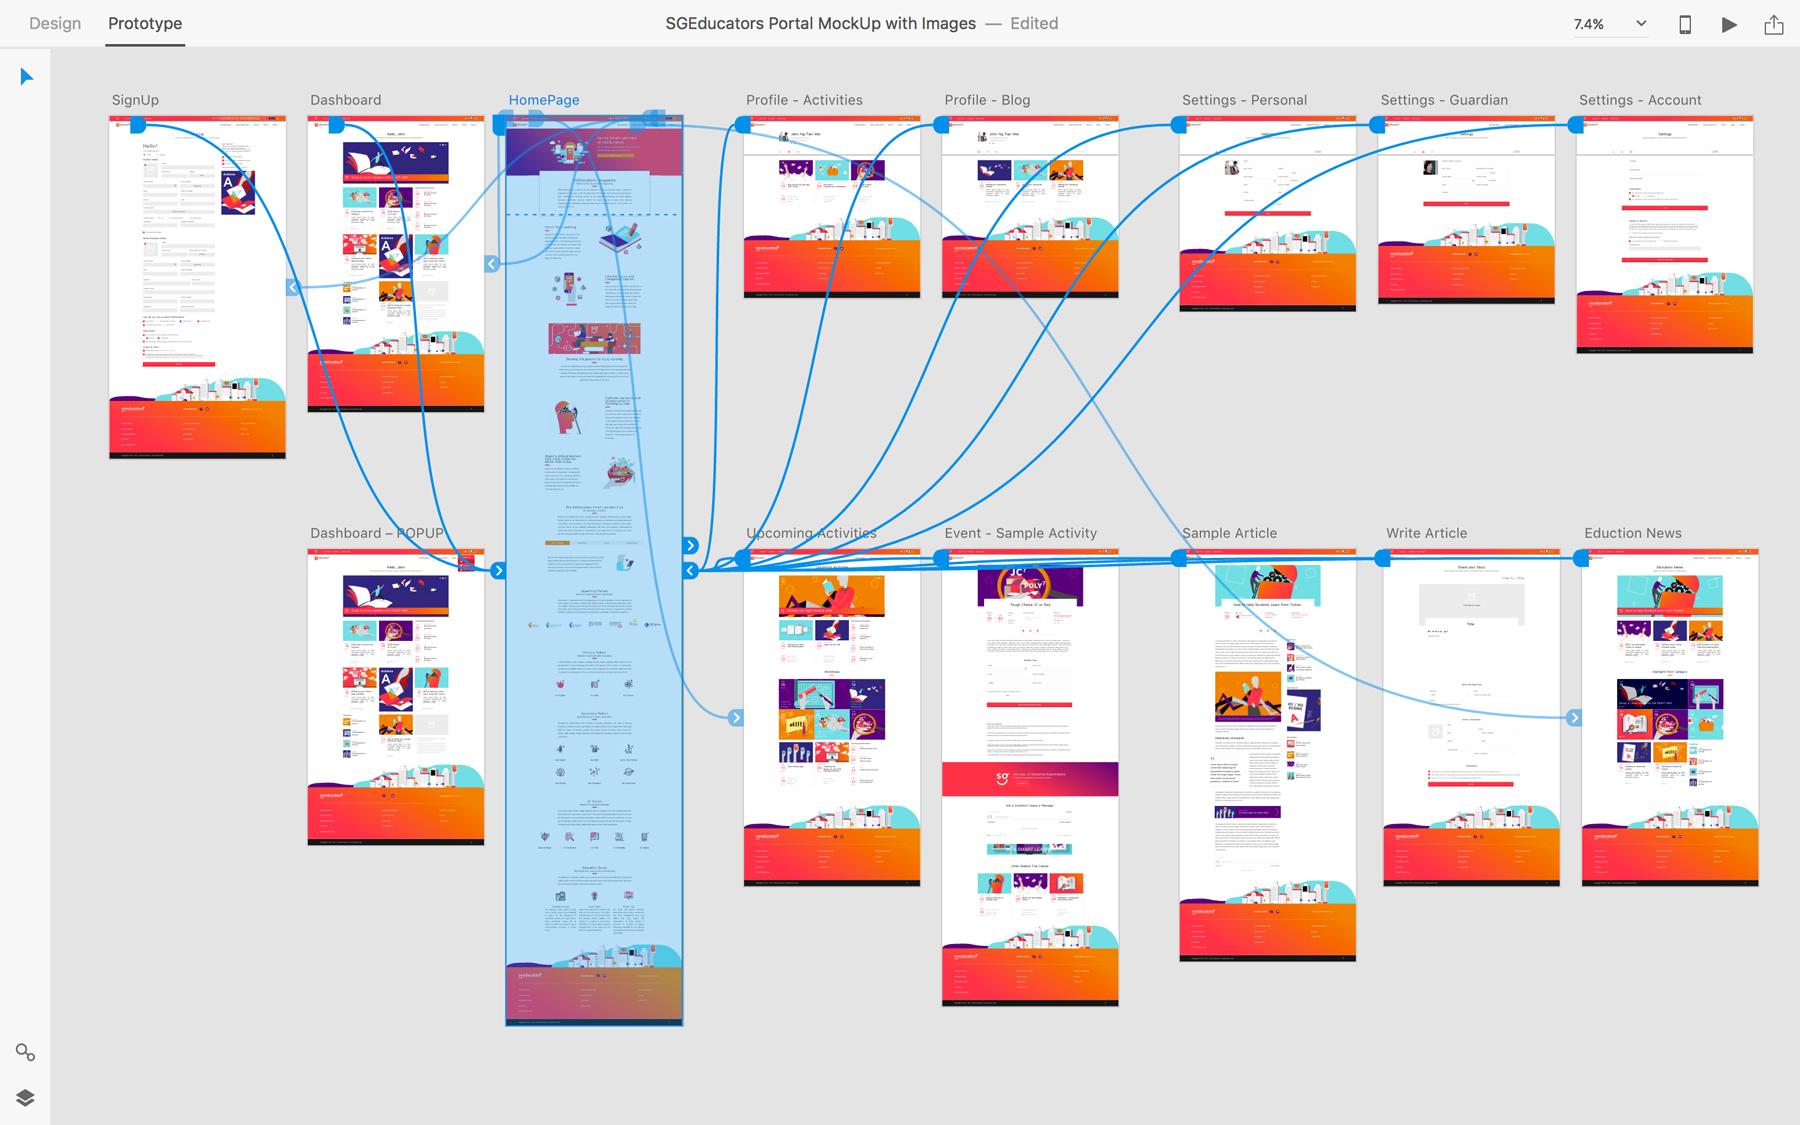 Design and Digital Marketing Portfolio - SGEducators Tuition Portal Development - Adobe XD Mockup 2